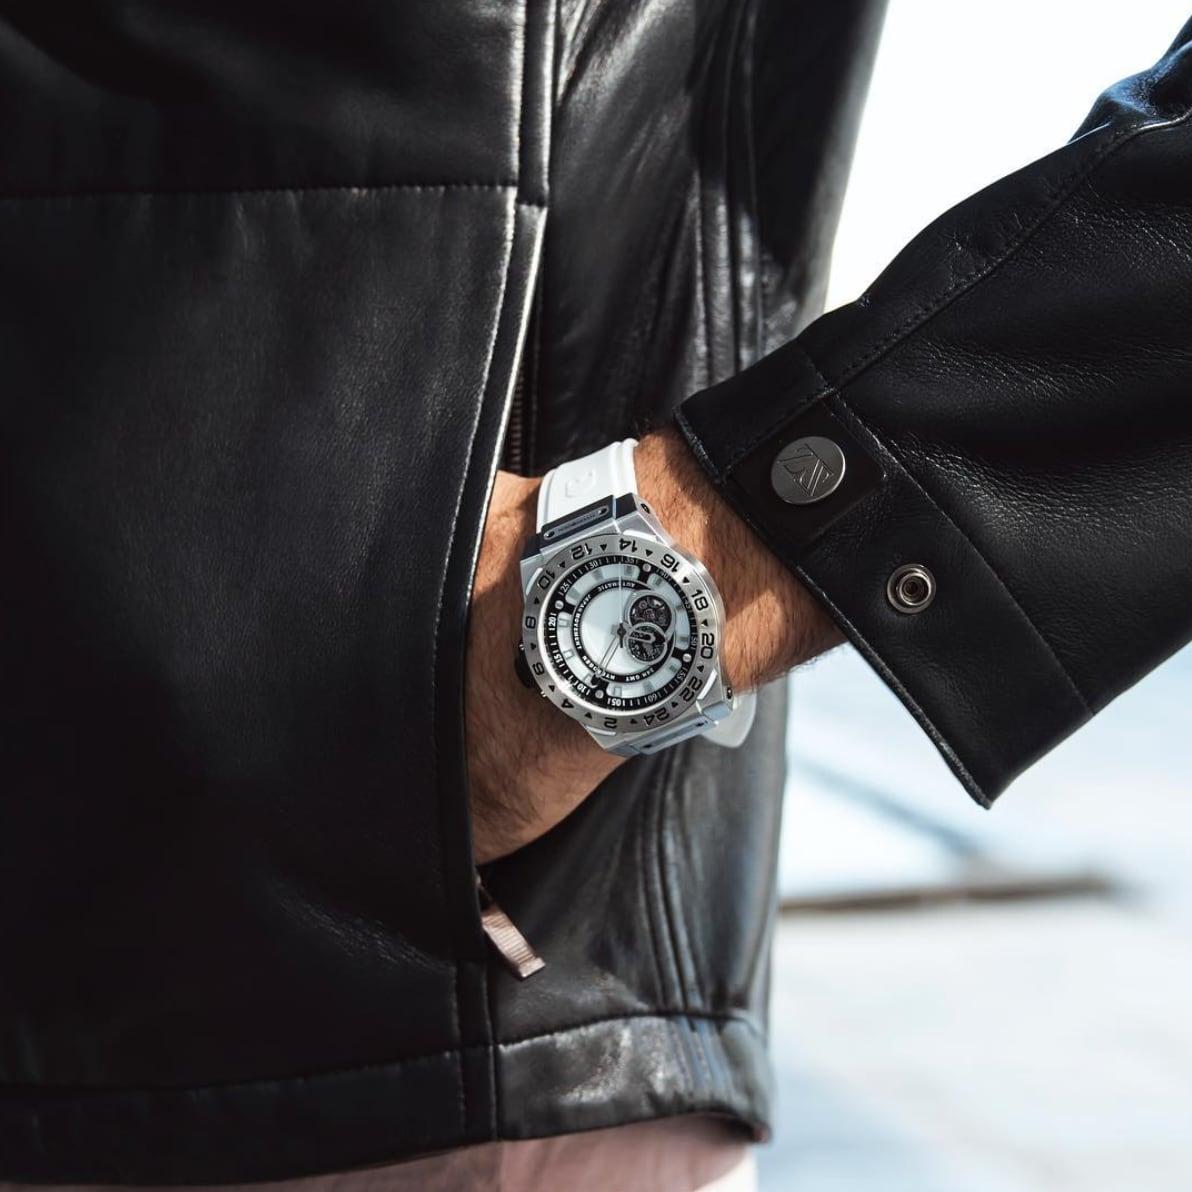 【HYDROGEN WATCH ハイドロゲンウォッチ】HW424400/VENTO ヴェント(ホワイト×シルバー)/国内正規品 腕時計